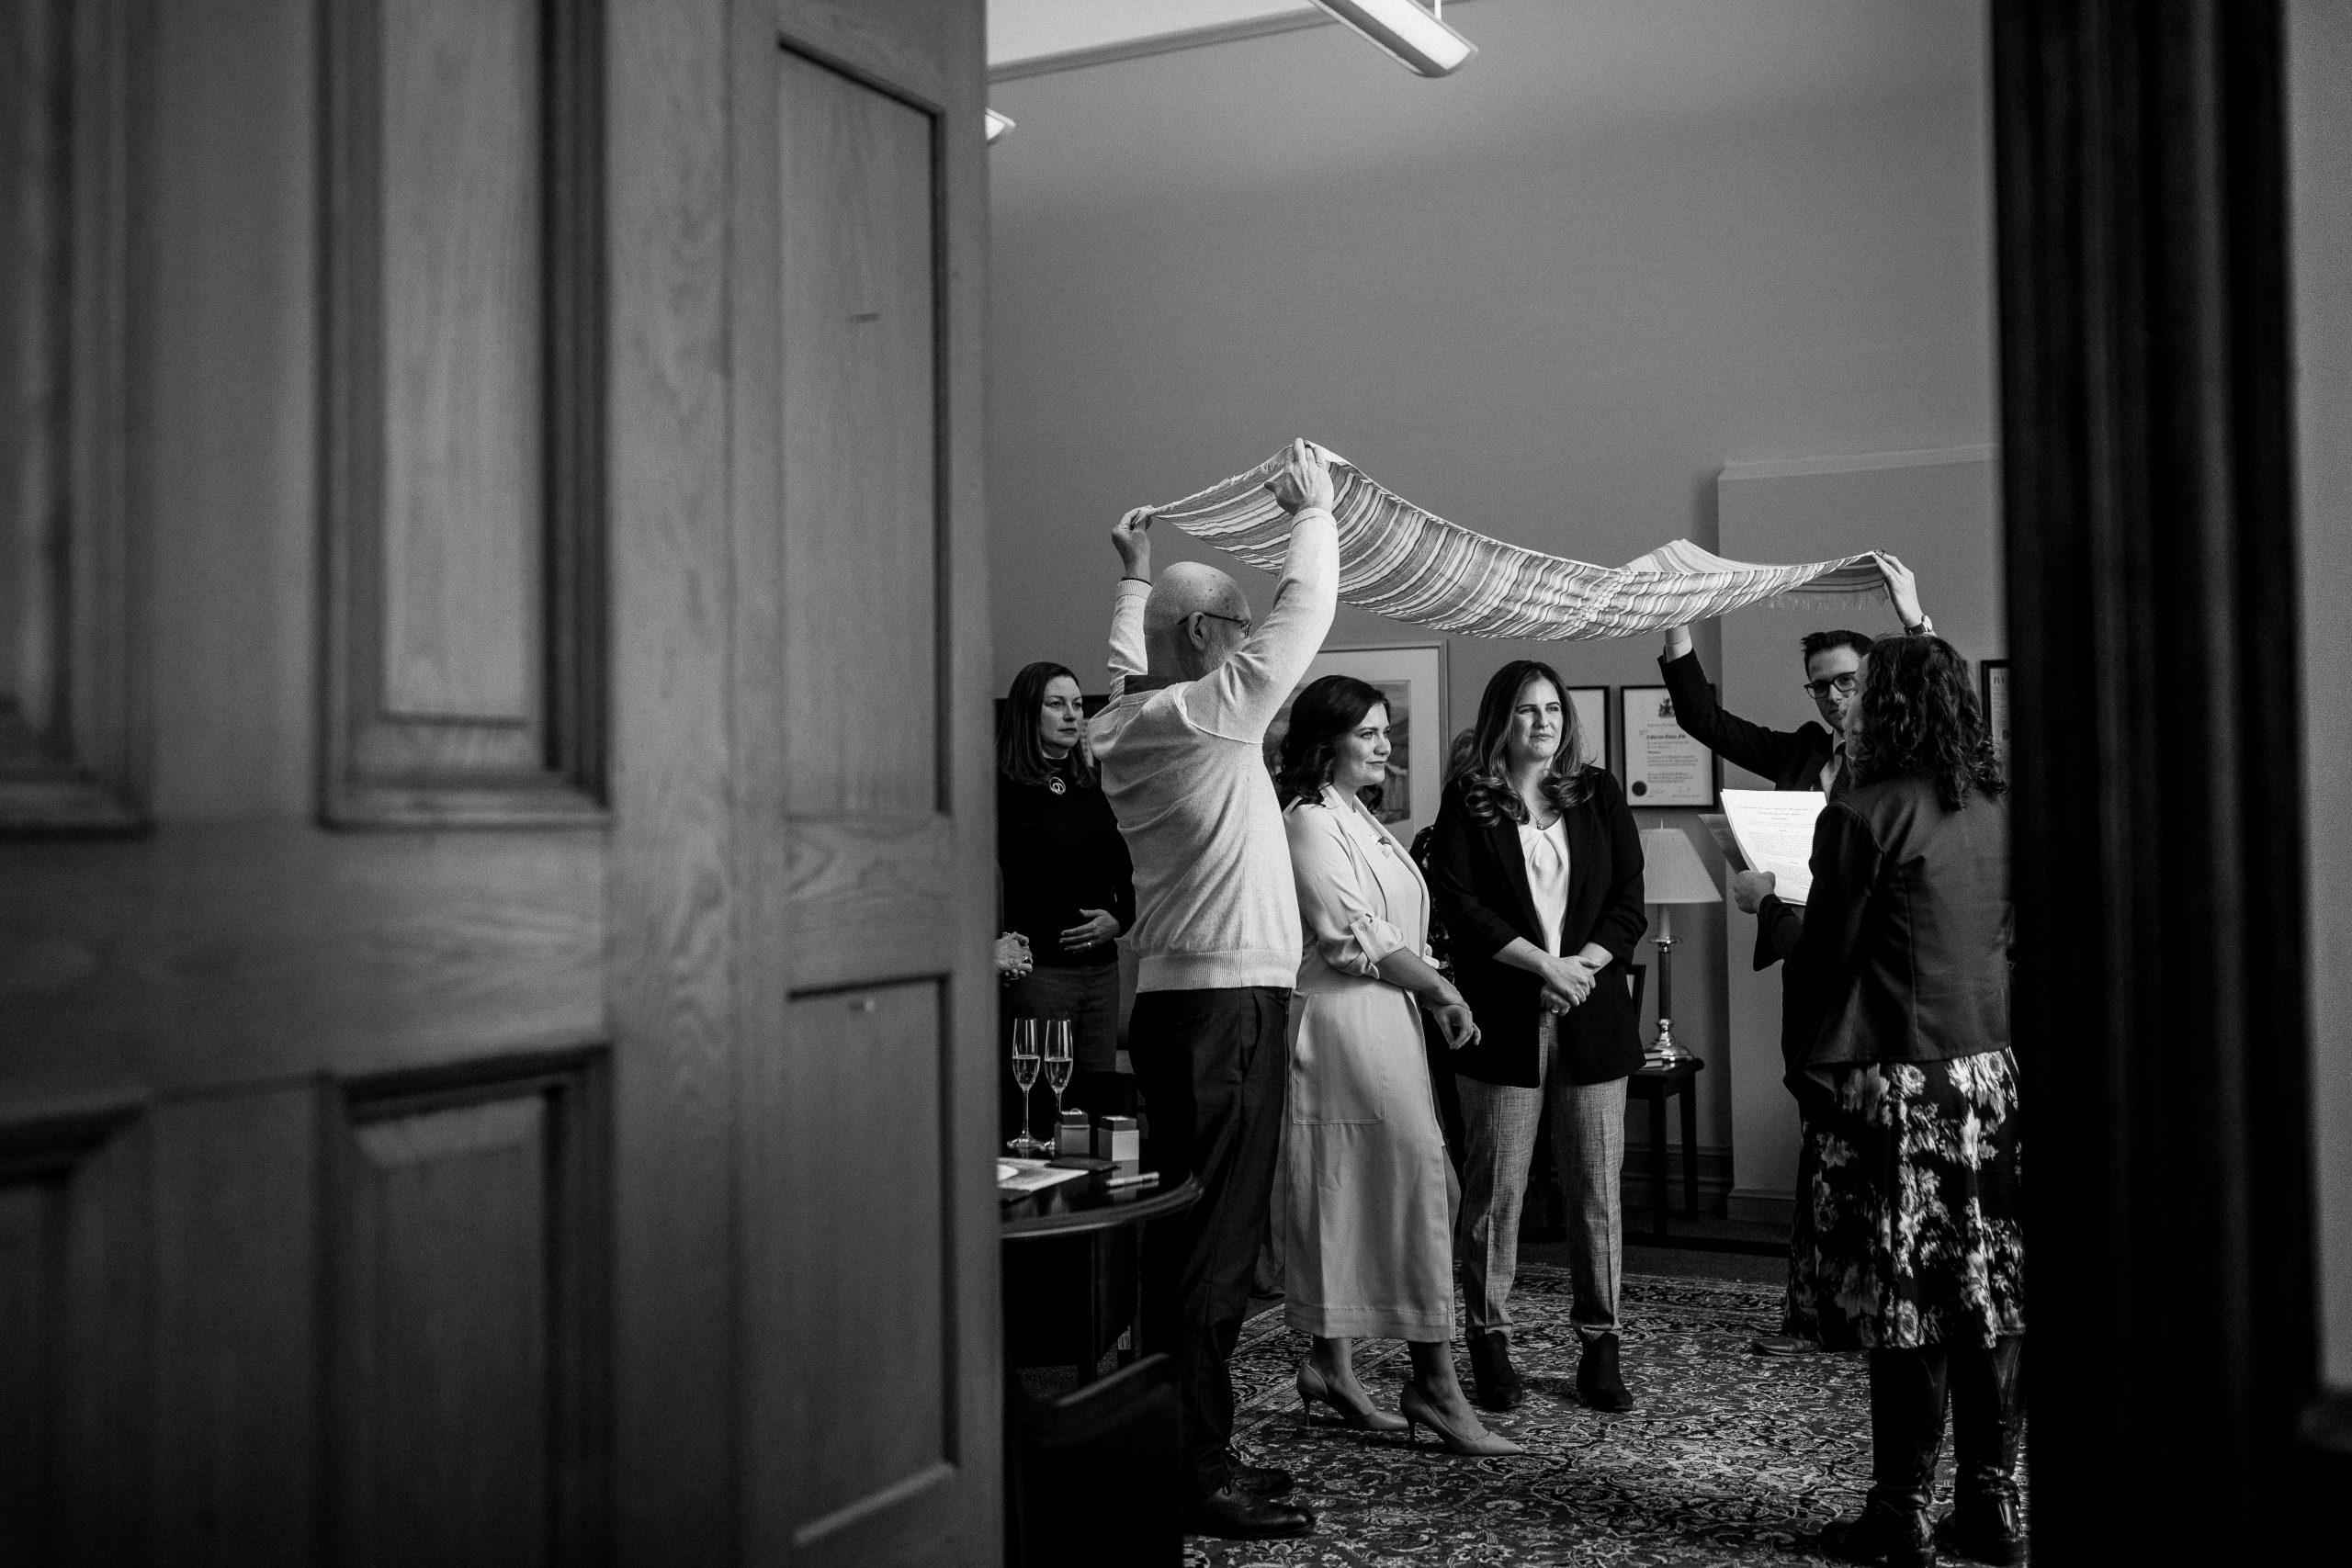 torontoweddingphotographers 2 scaled - COVID-19 and Weddings: What If your Wedding Happens during Coronavirus Pandemic